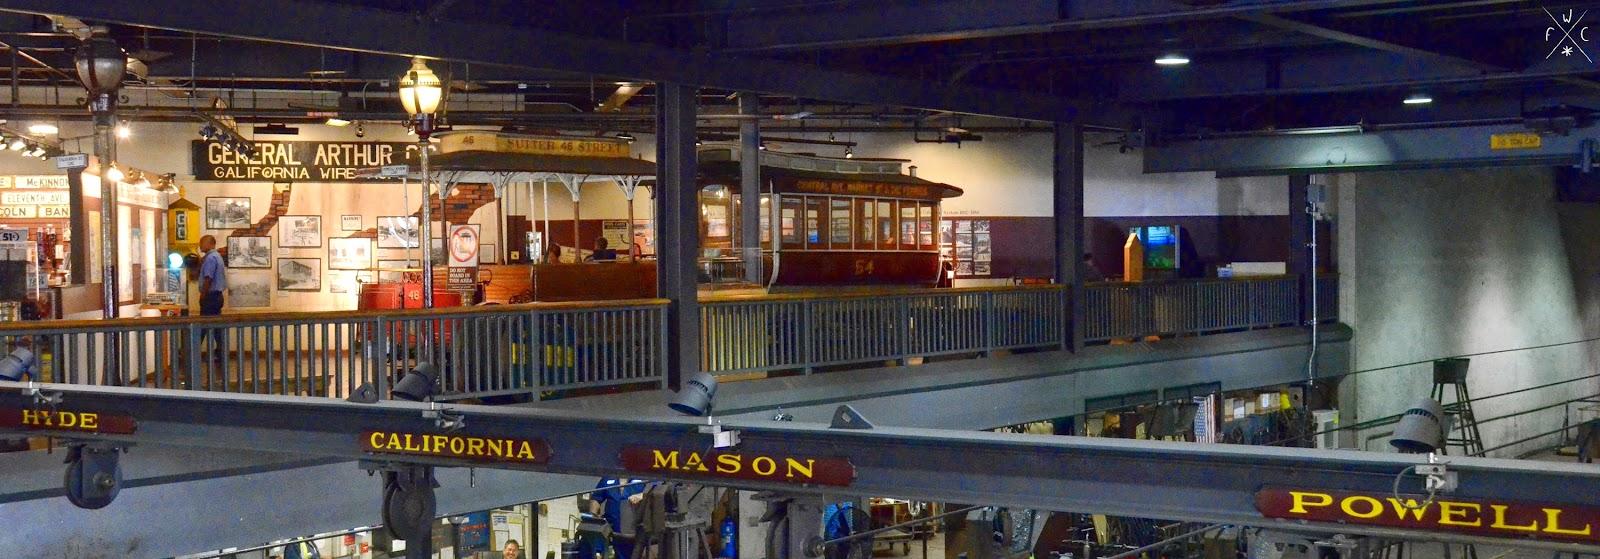 Cable Car Museum - San Francisco, Californie, USA